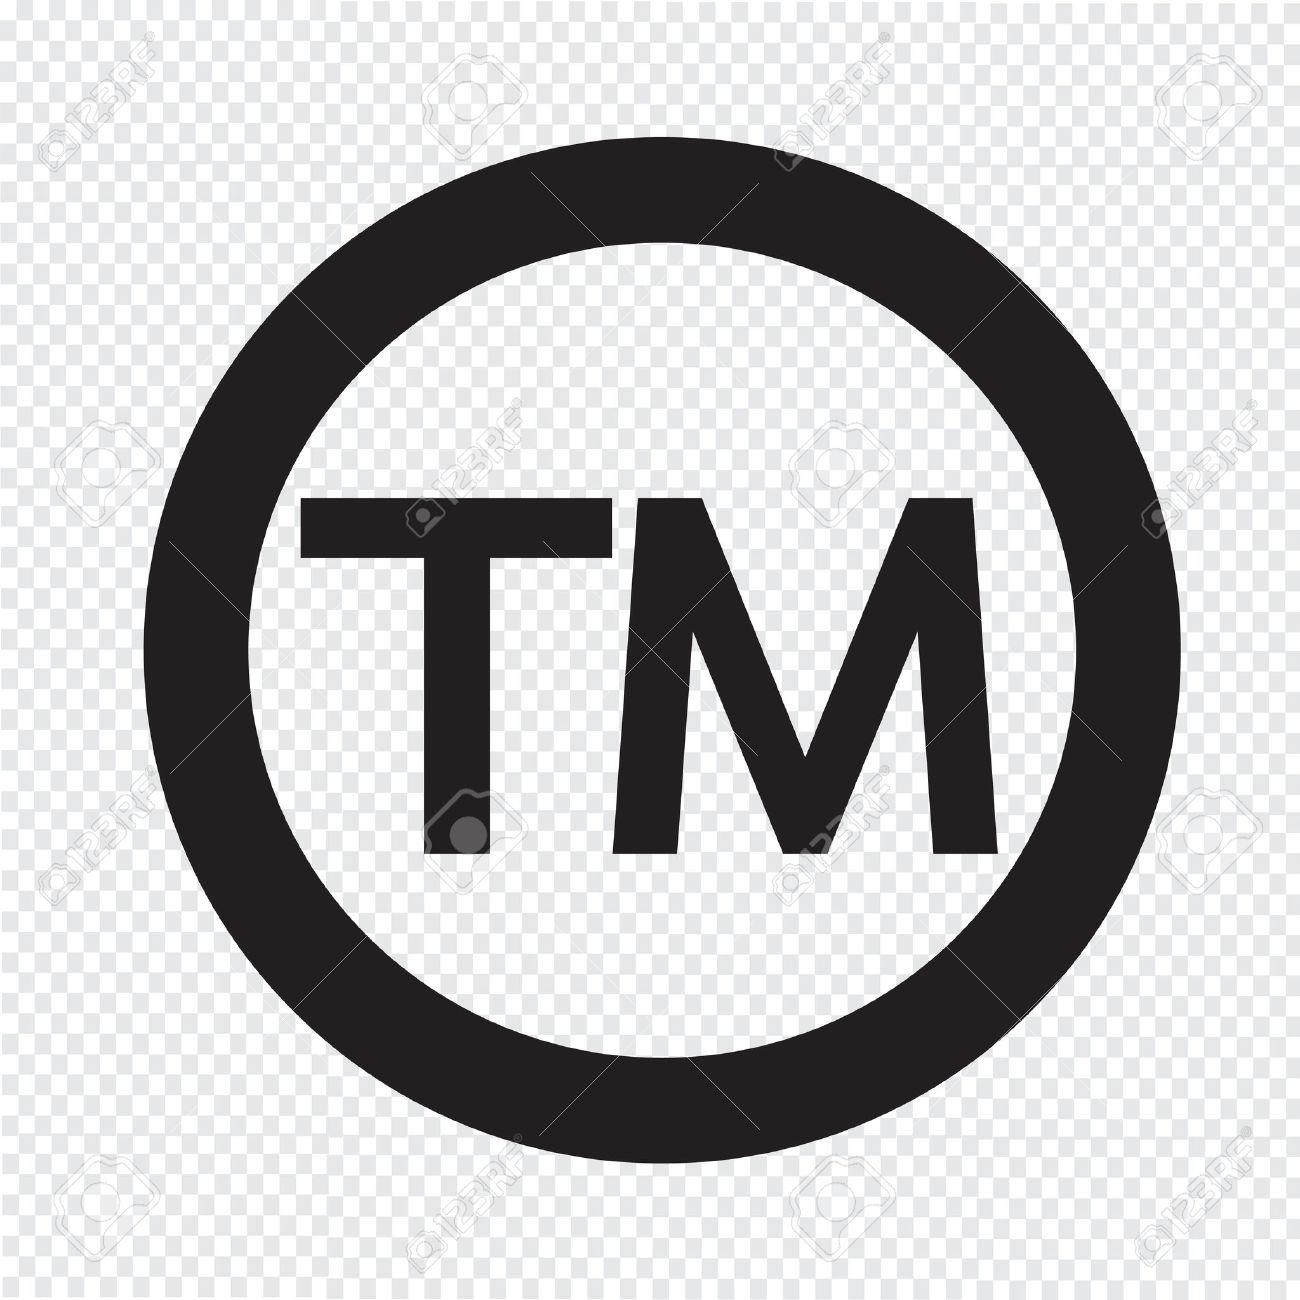 Clipart trademark symbol.